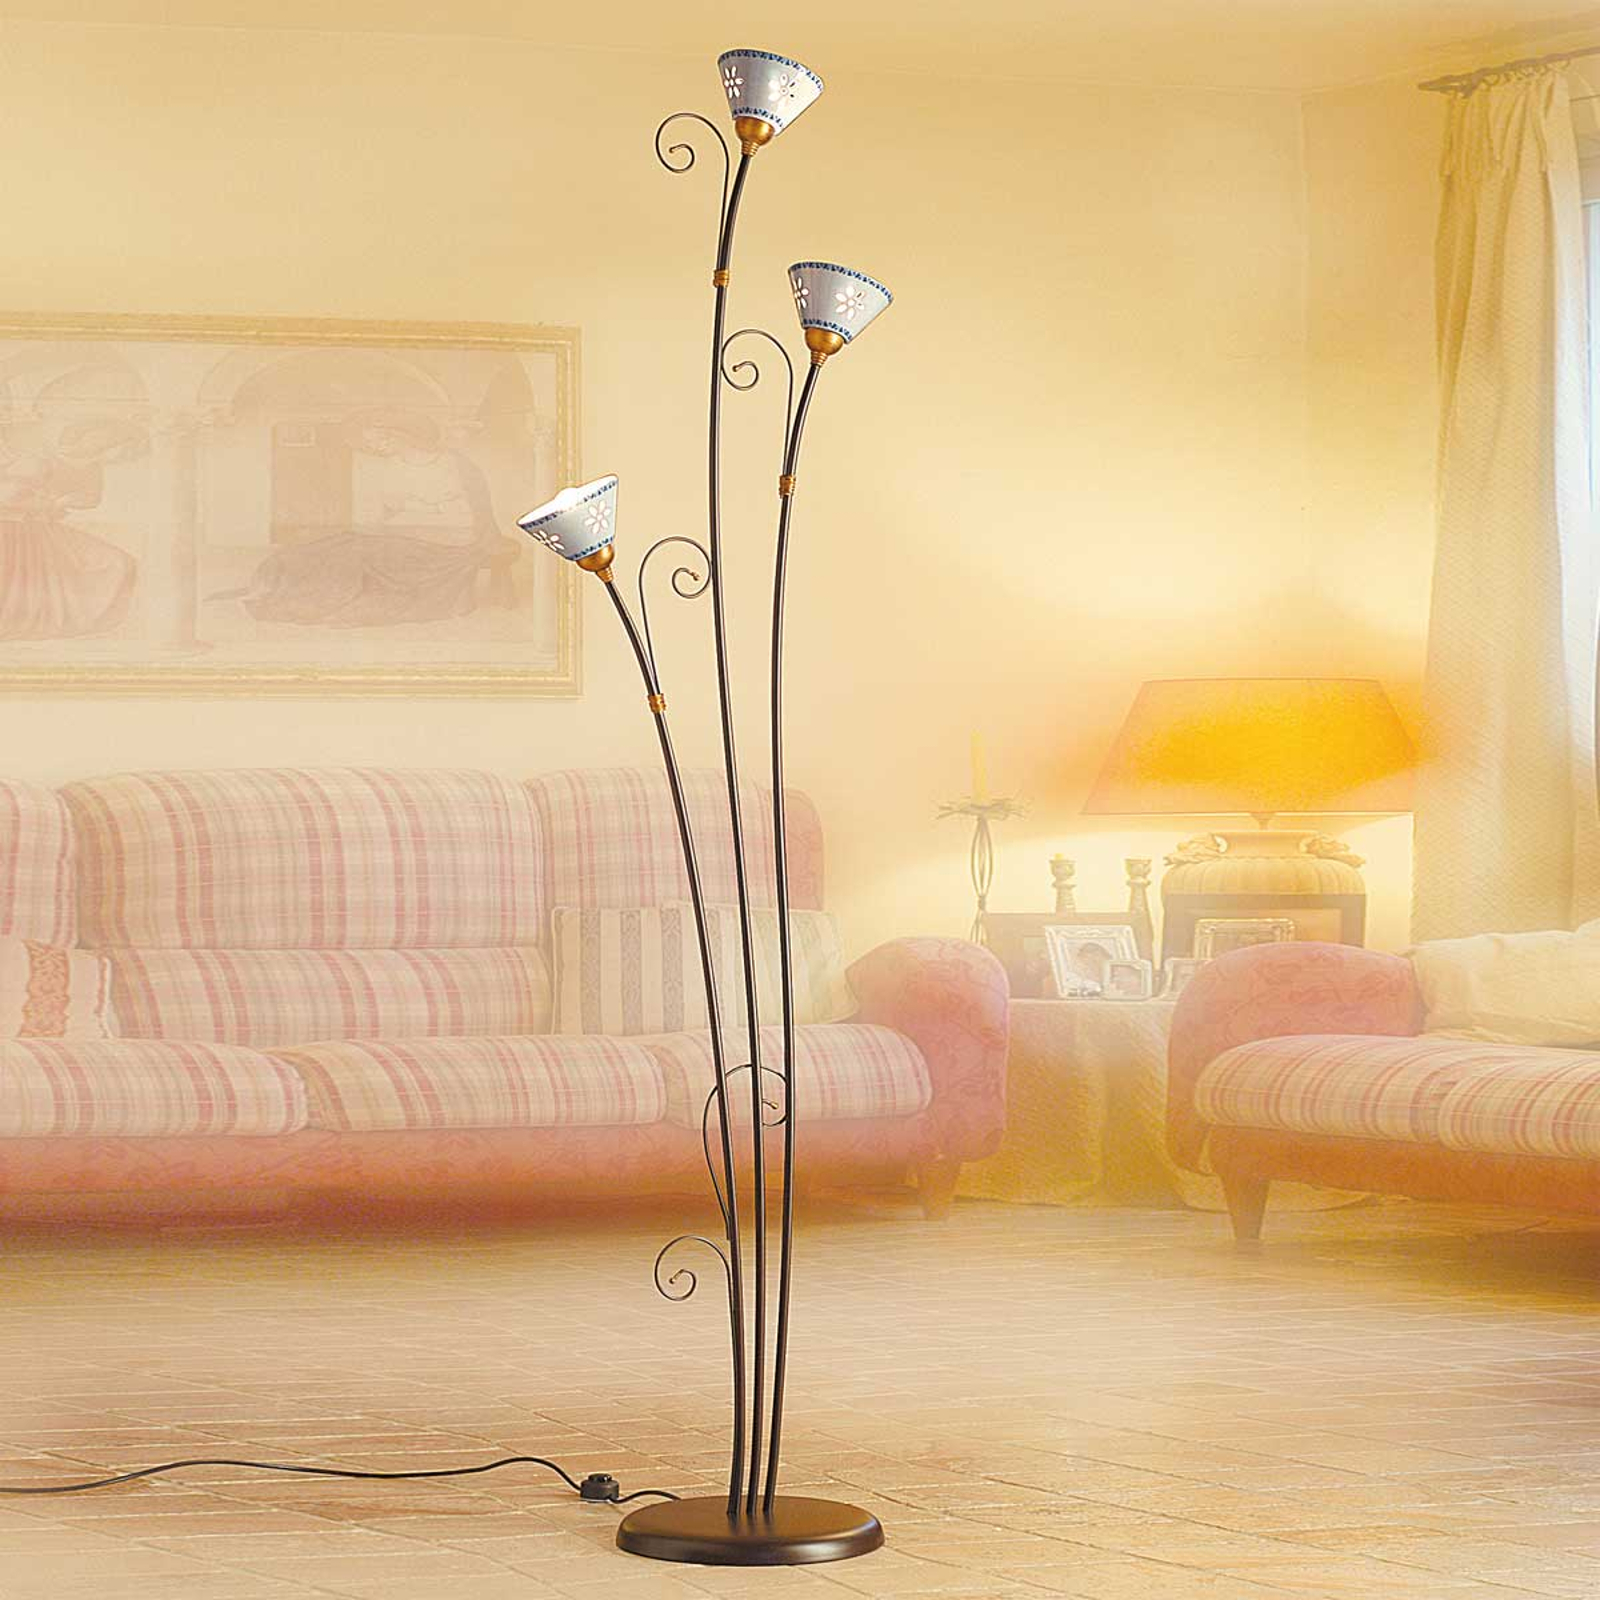 LIBERTY stålampe med tre lys